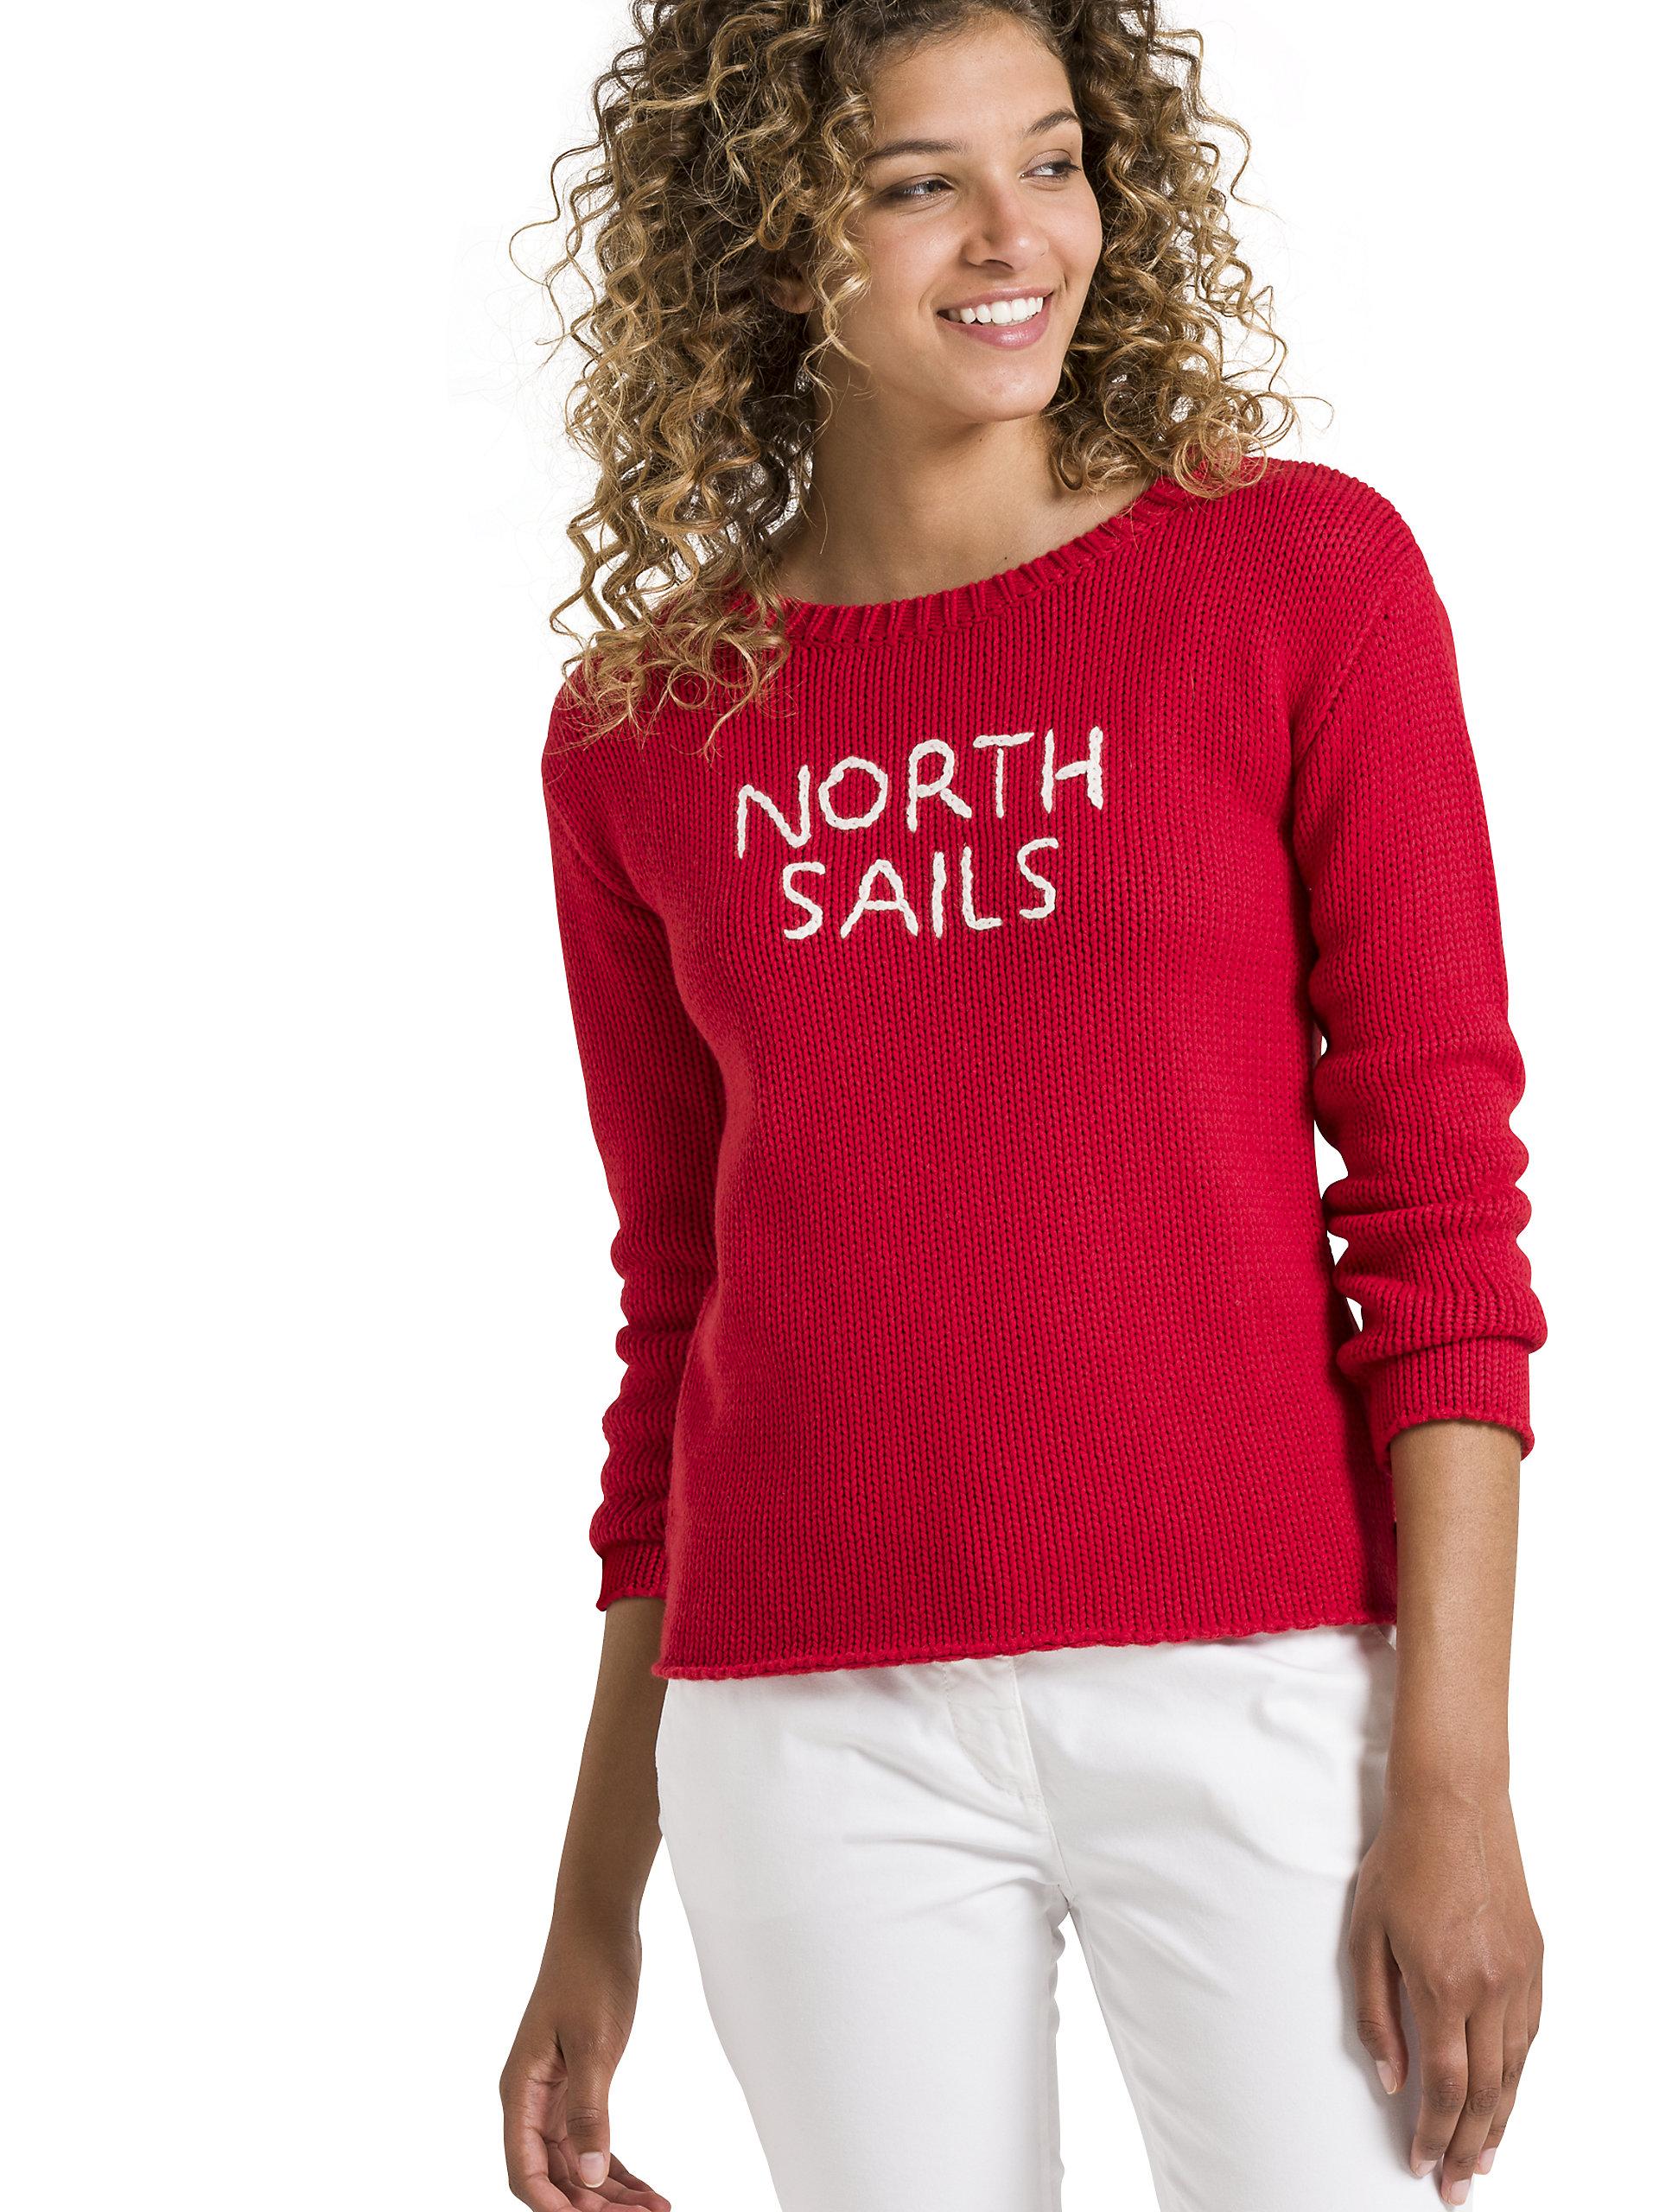 Laine M Femmes Manches En Longues Pull North Sails 6nYwfq0w7